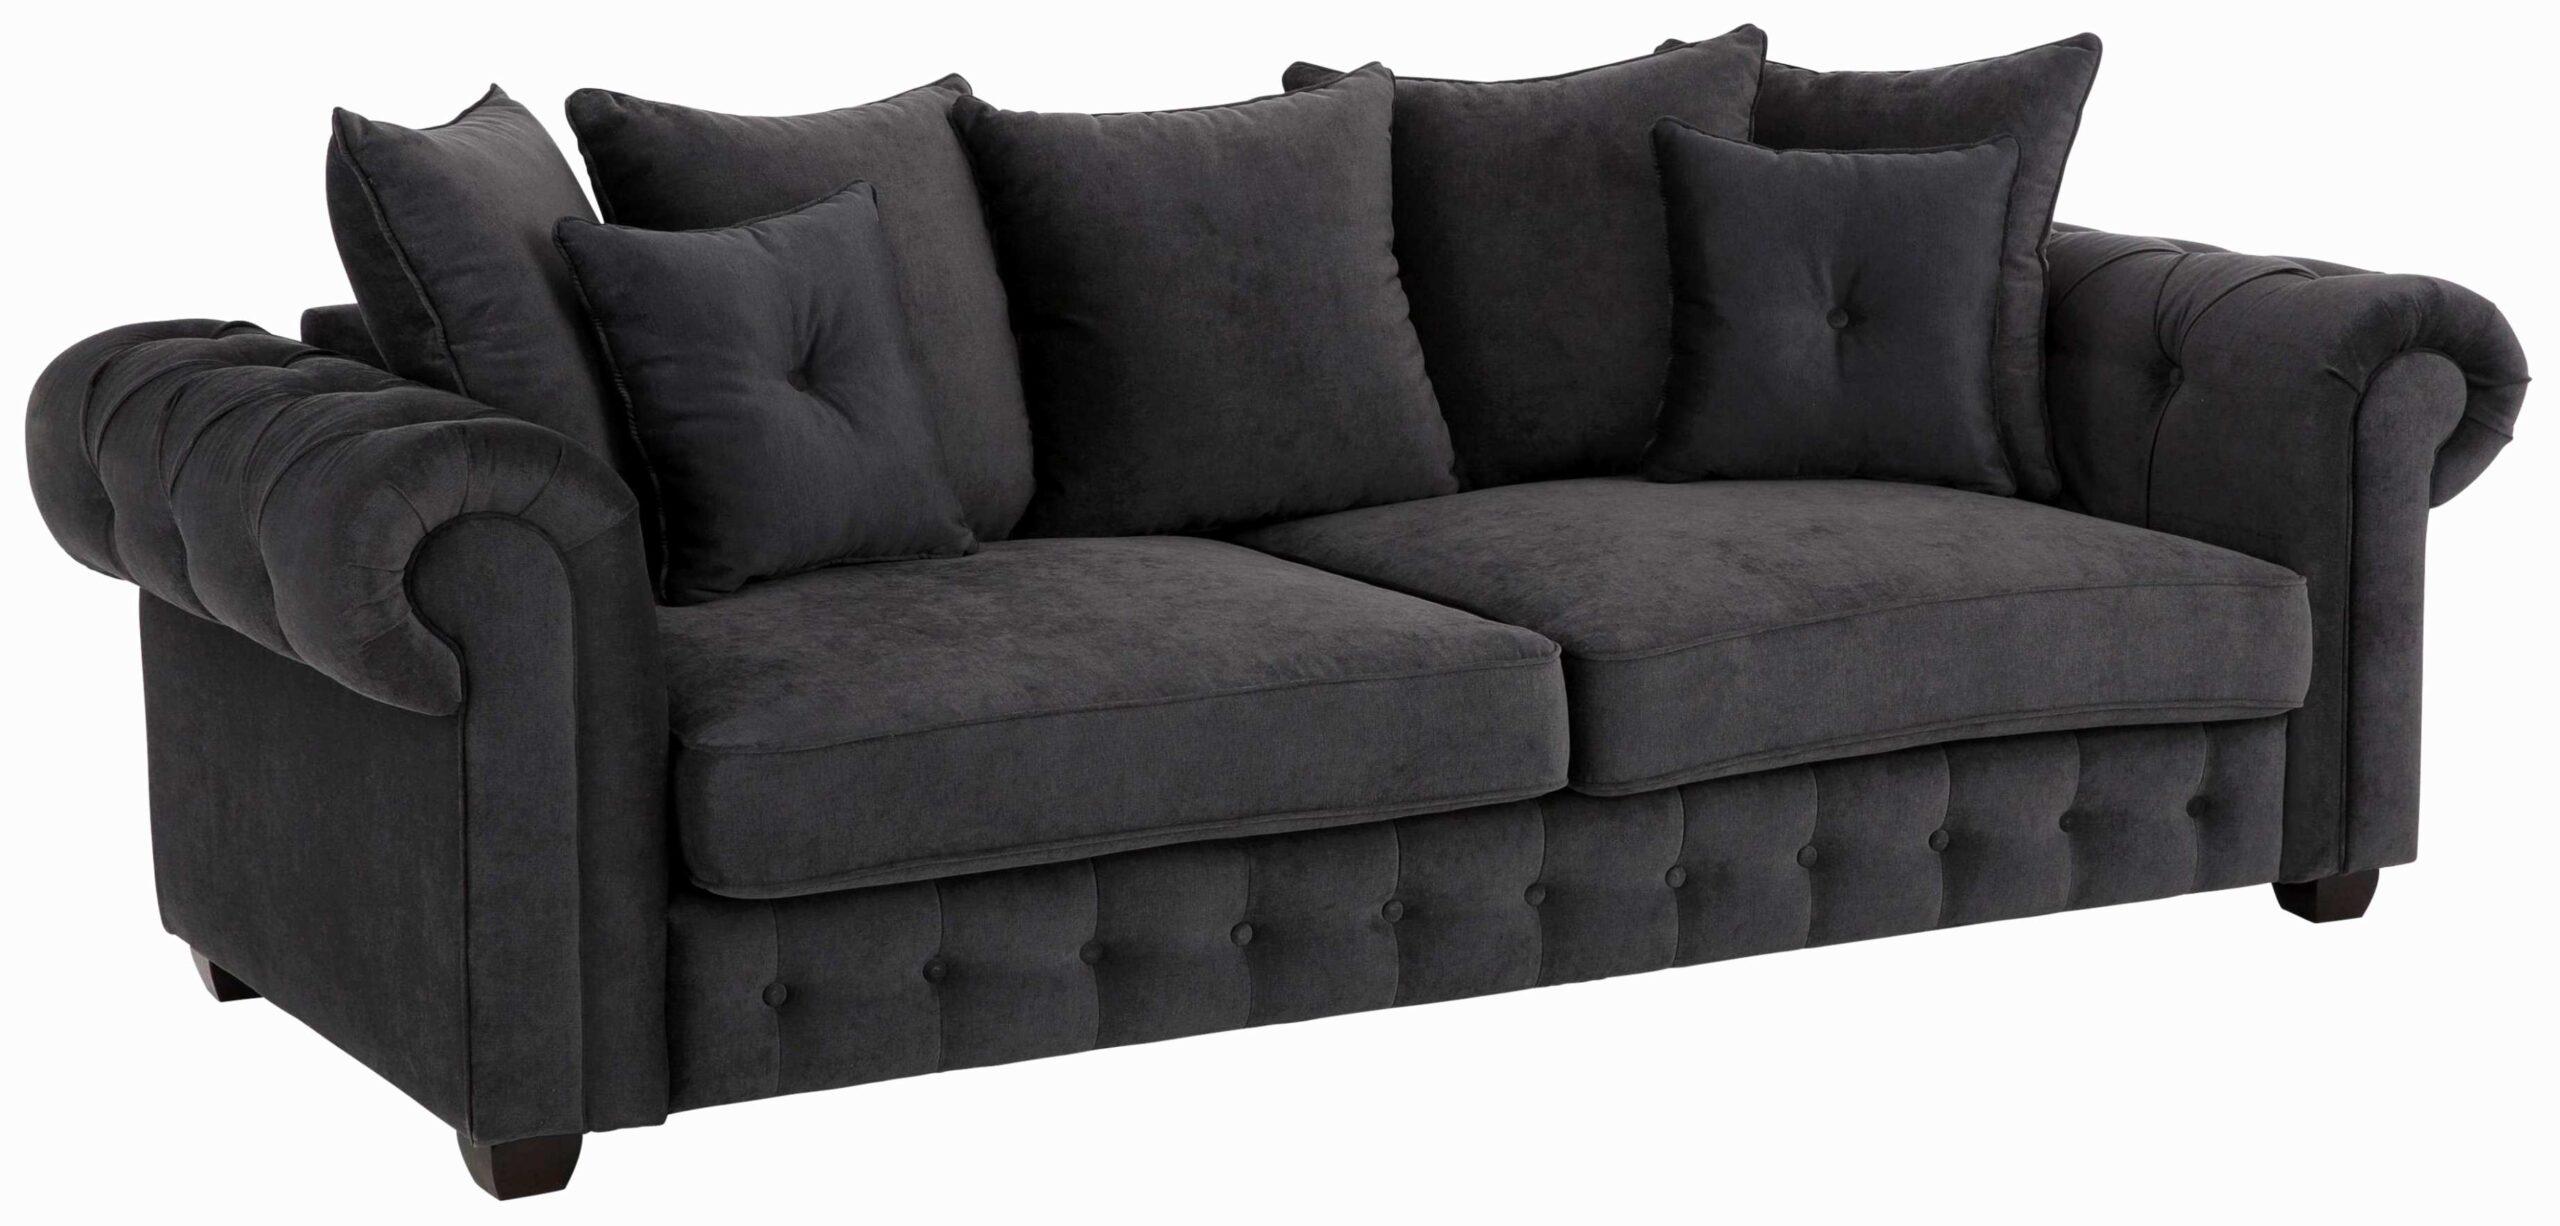 Full Size of Alcantara Sofa Cleaner Cleaning Sofascore Reinigung Leder Kaufen For Sale Bed Couch Reinigen Helles Tennis Uk Lassen 3 Sitzer Xxl Günstig In L Form Sofort Sofa Alcantara Sofa